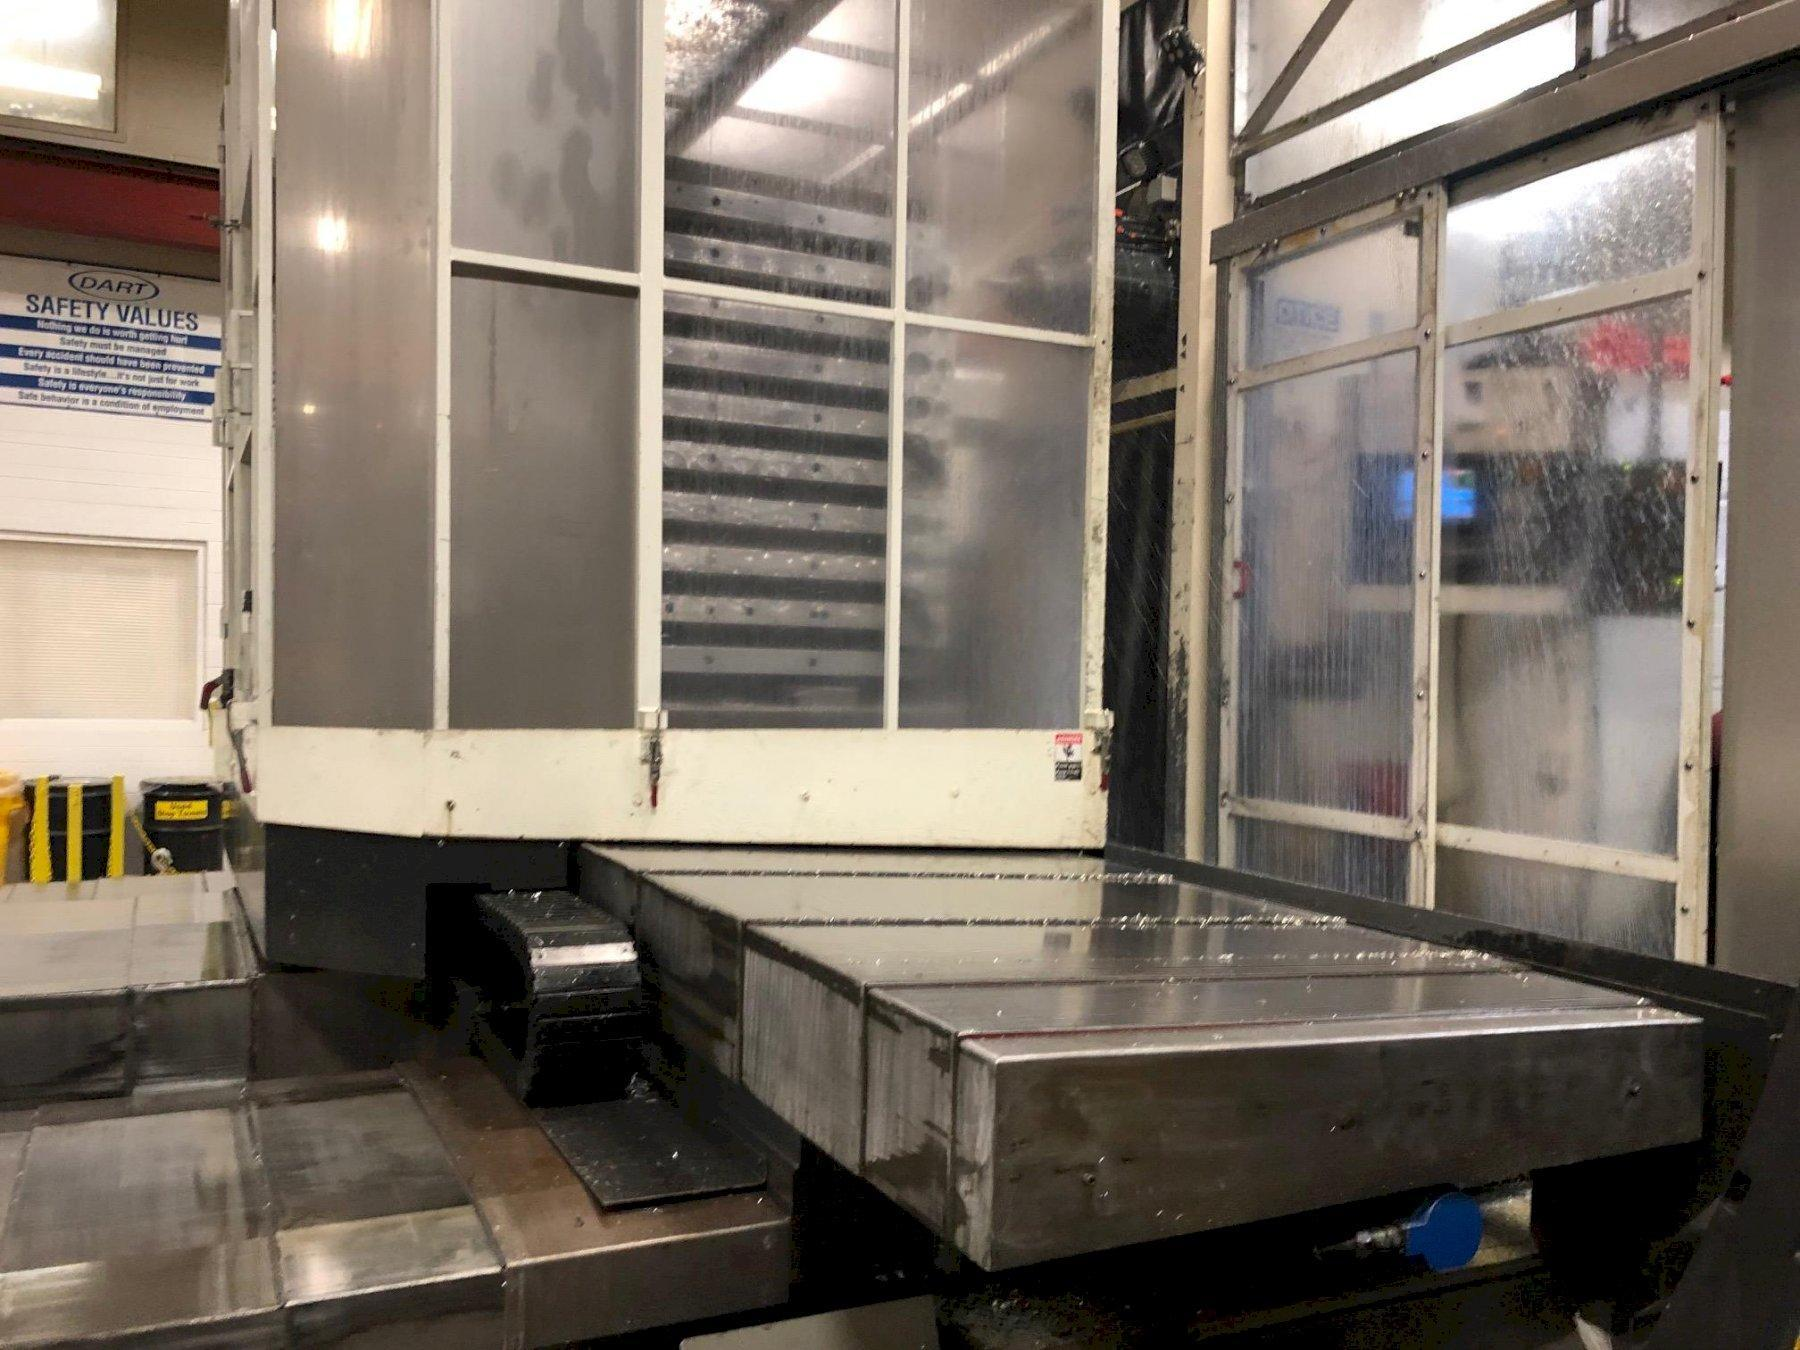 Toshiba BTD-110R16 CNC Table Type Horizontal Boring Mill